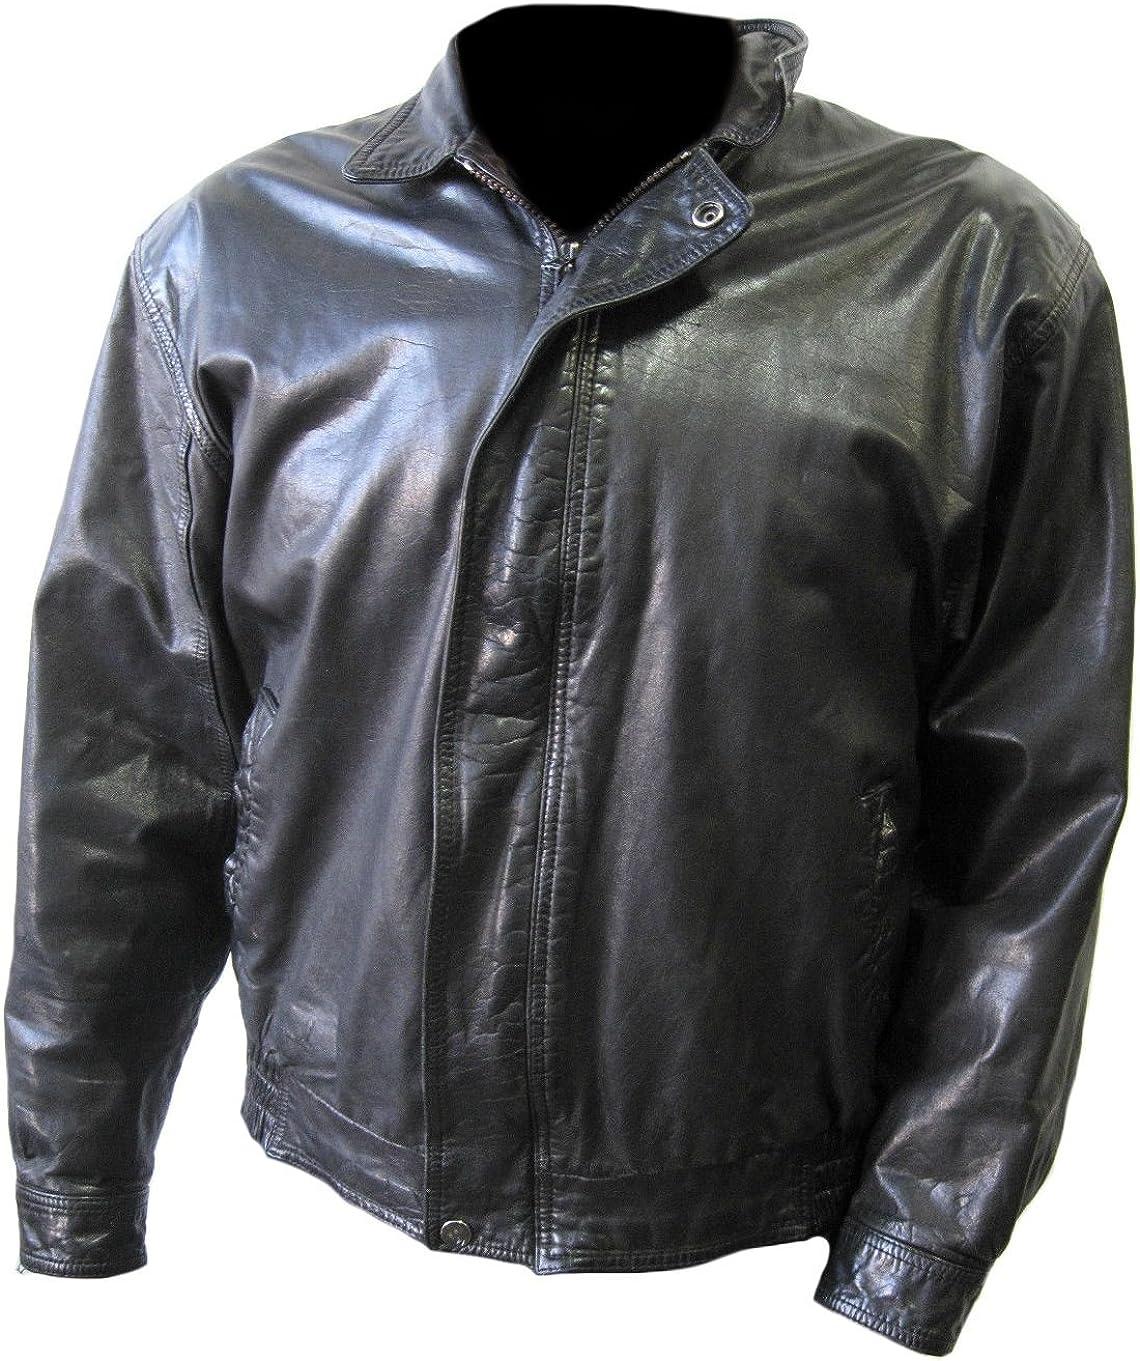 Classyak Men's Fashion Stylish Real Leather Jacket